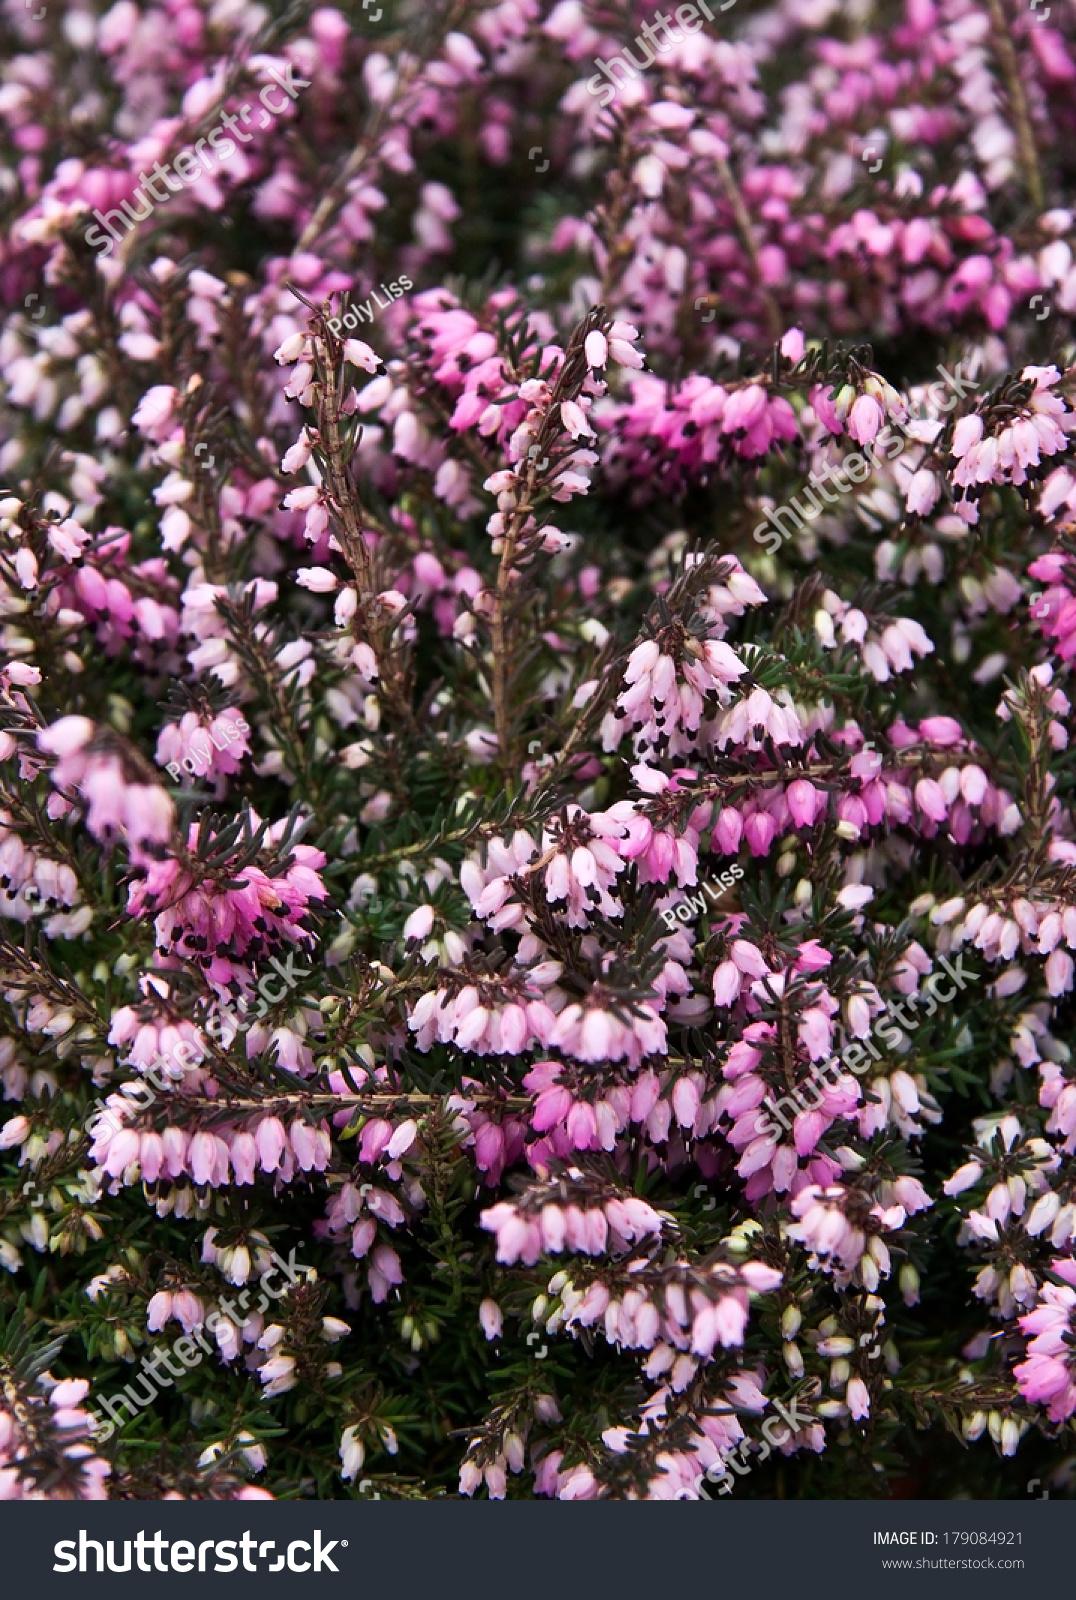 Pink Winter Heath Flowers Stock Photo Edit Now 179084921